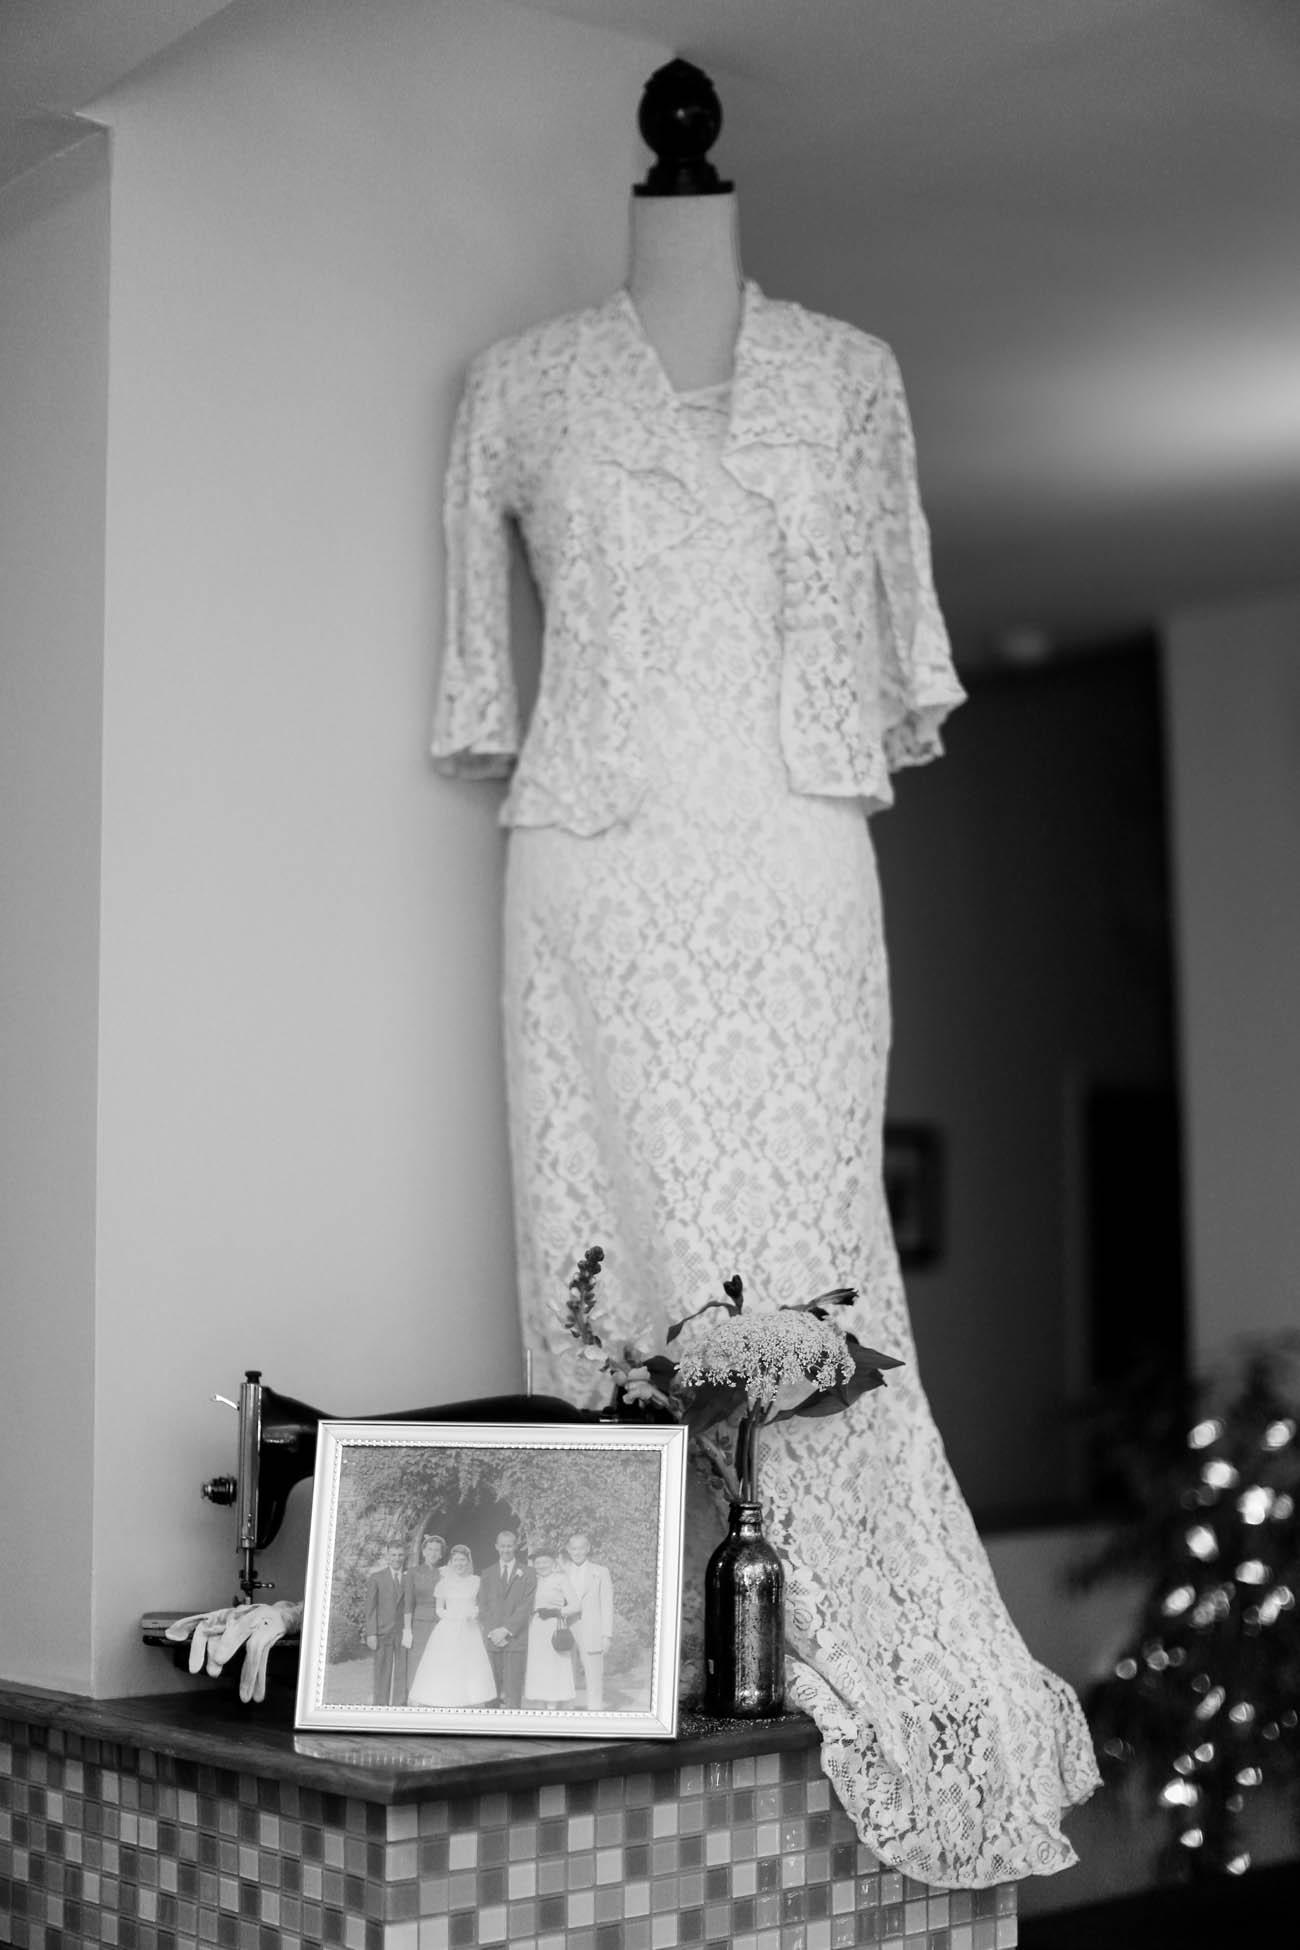 Speakeasy-1920s-theme-Louisville-and-Lexington Wedding-356.jpg